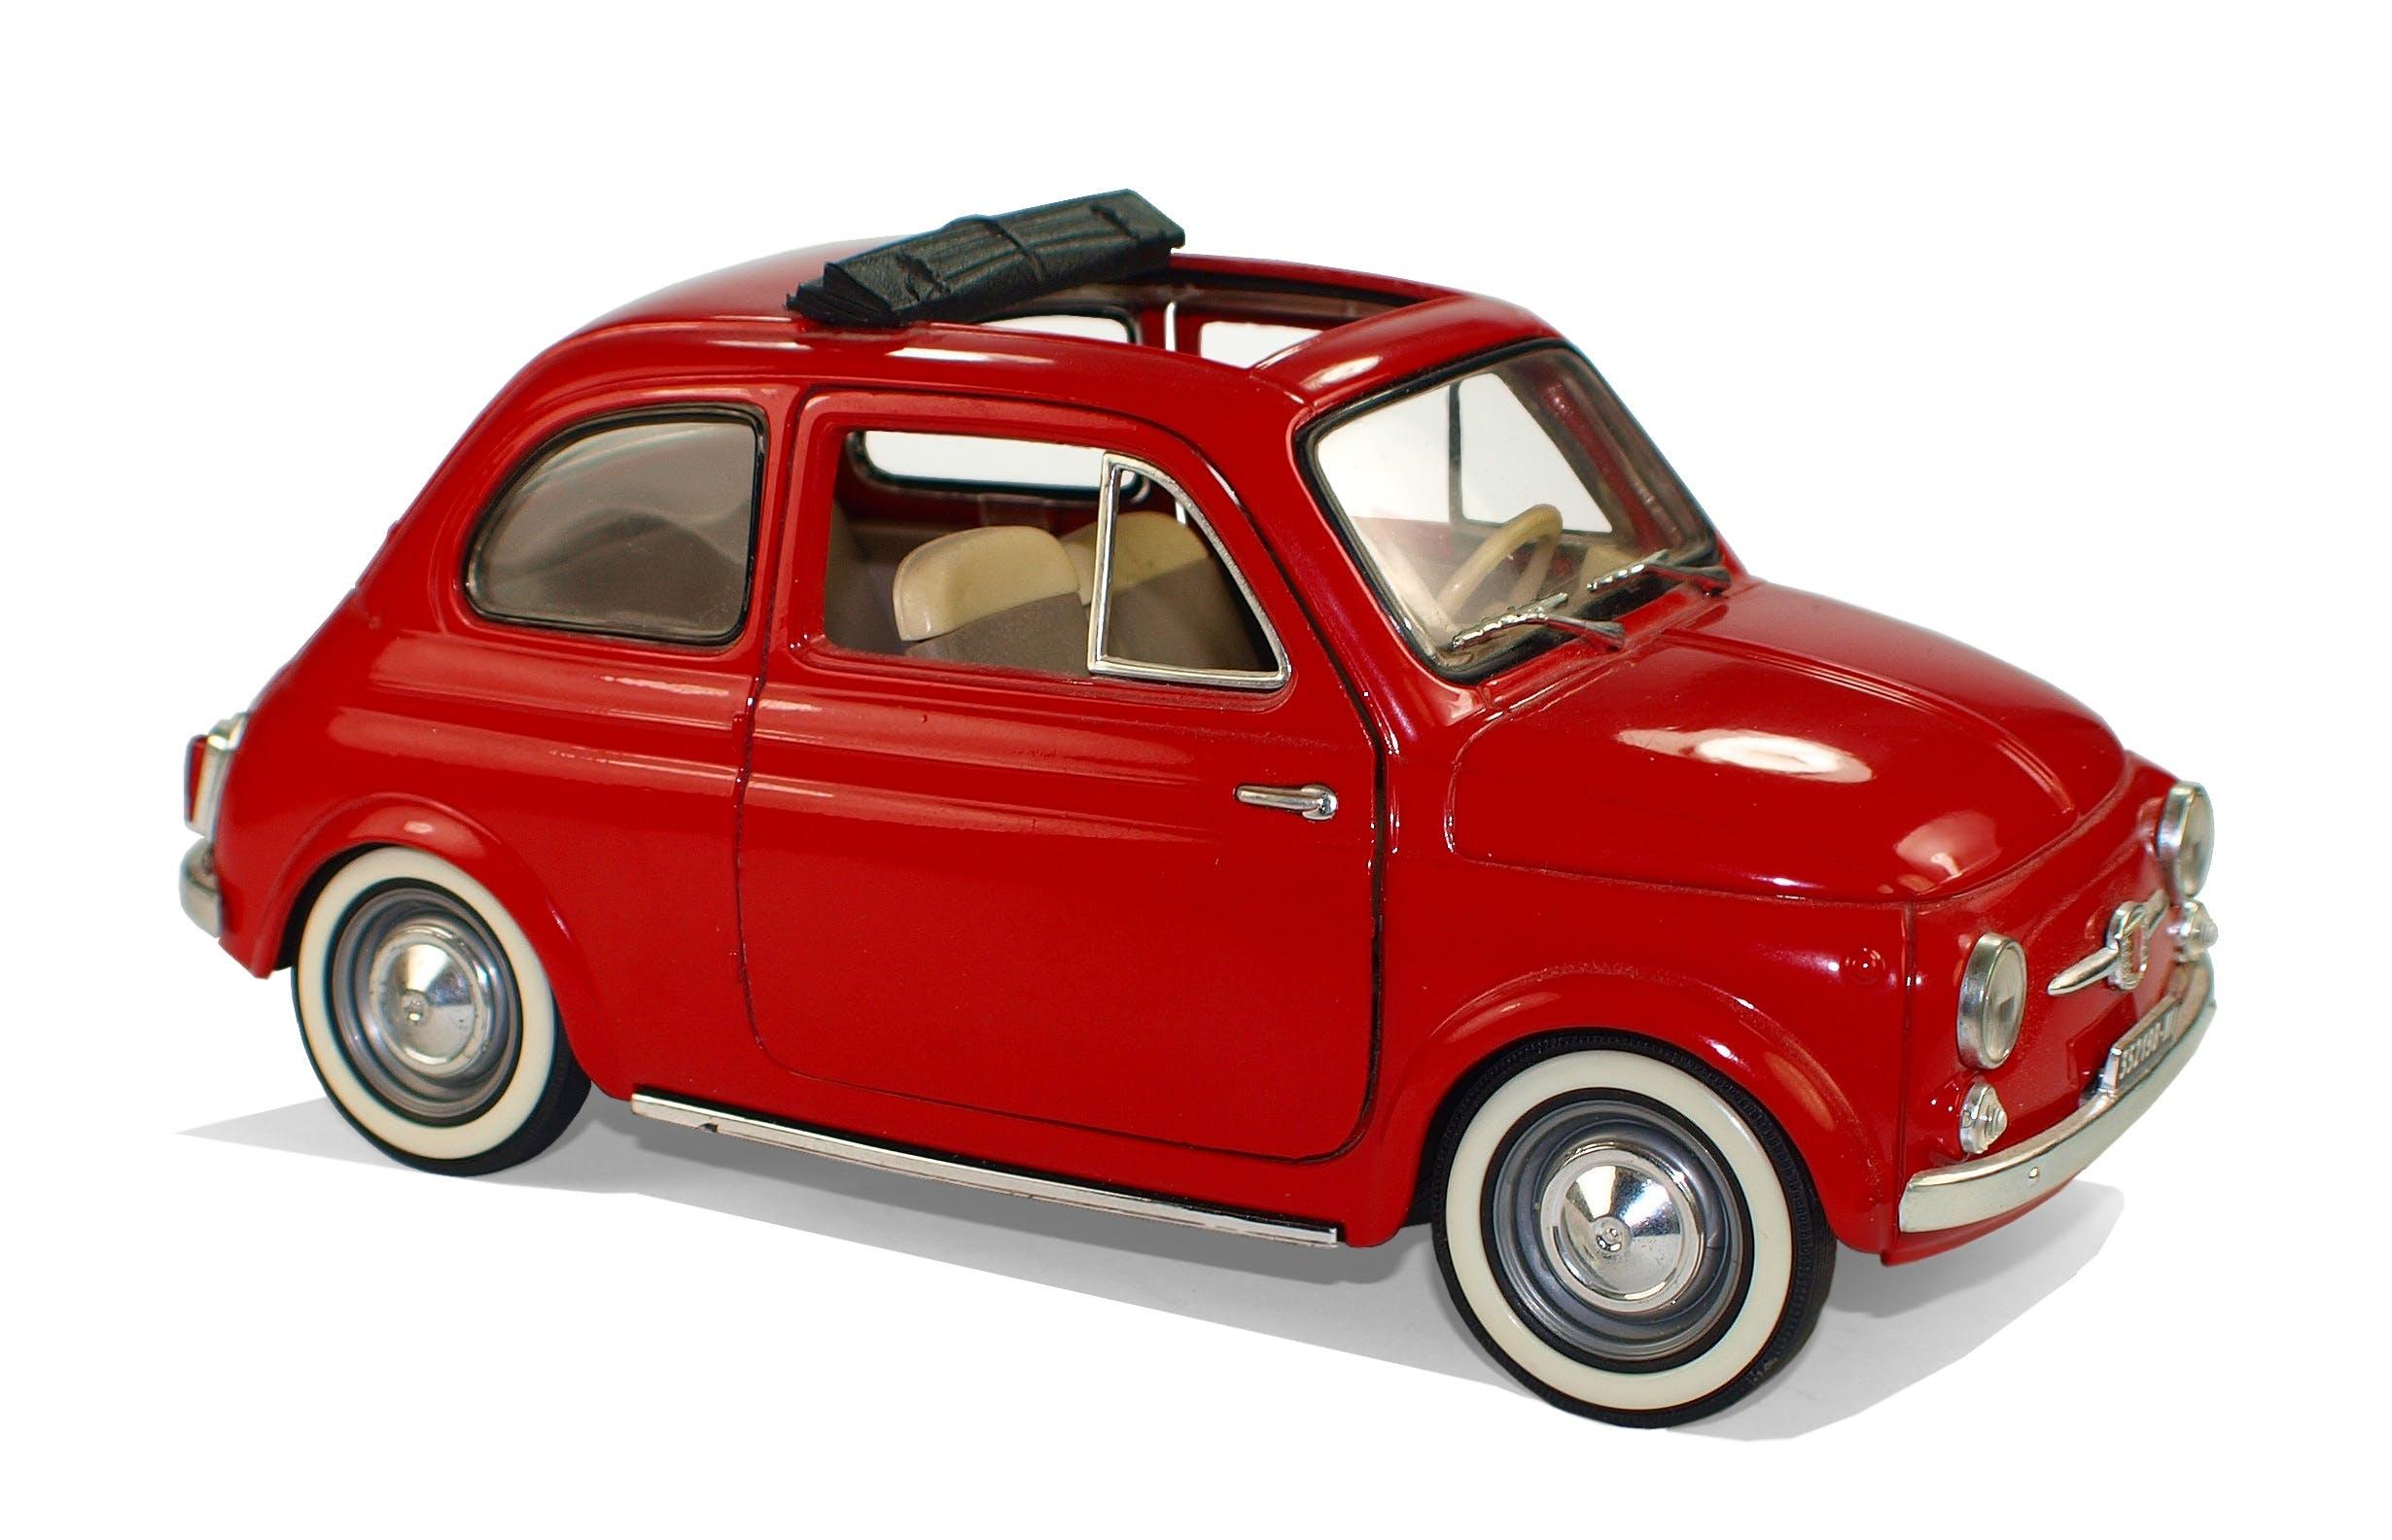 Red Classic Fiat 500